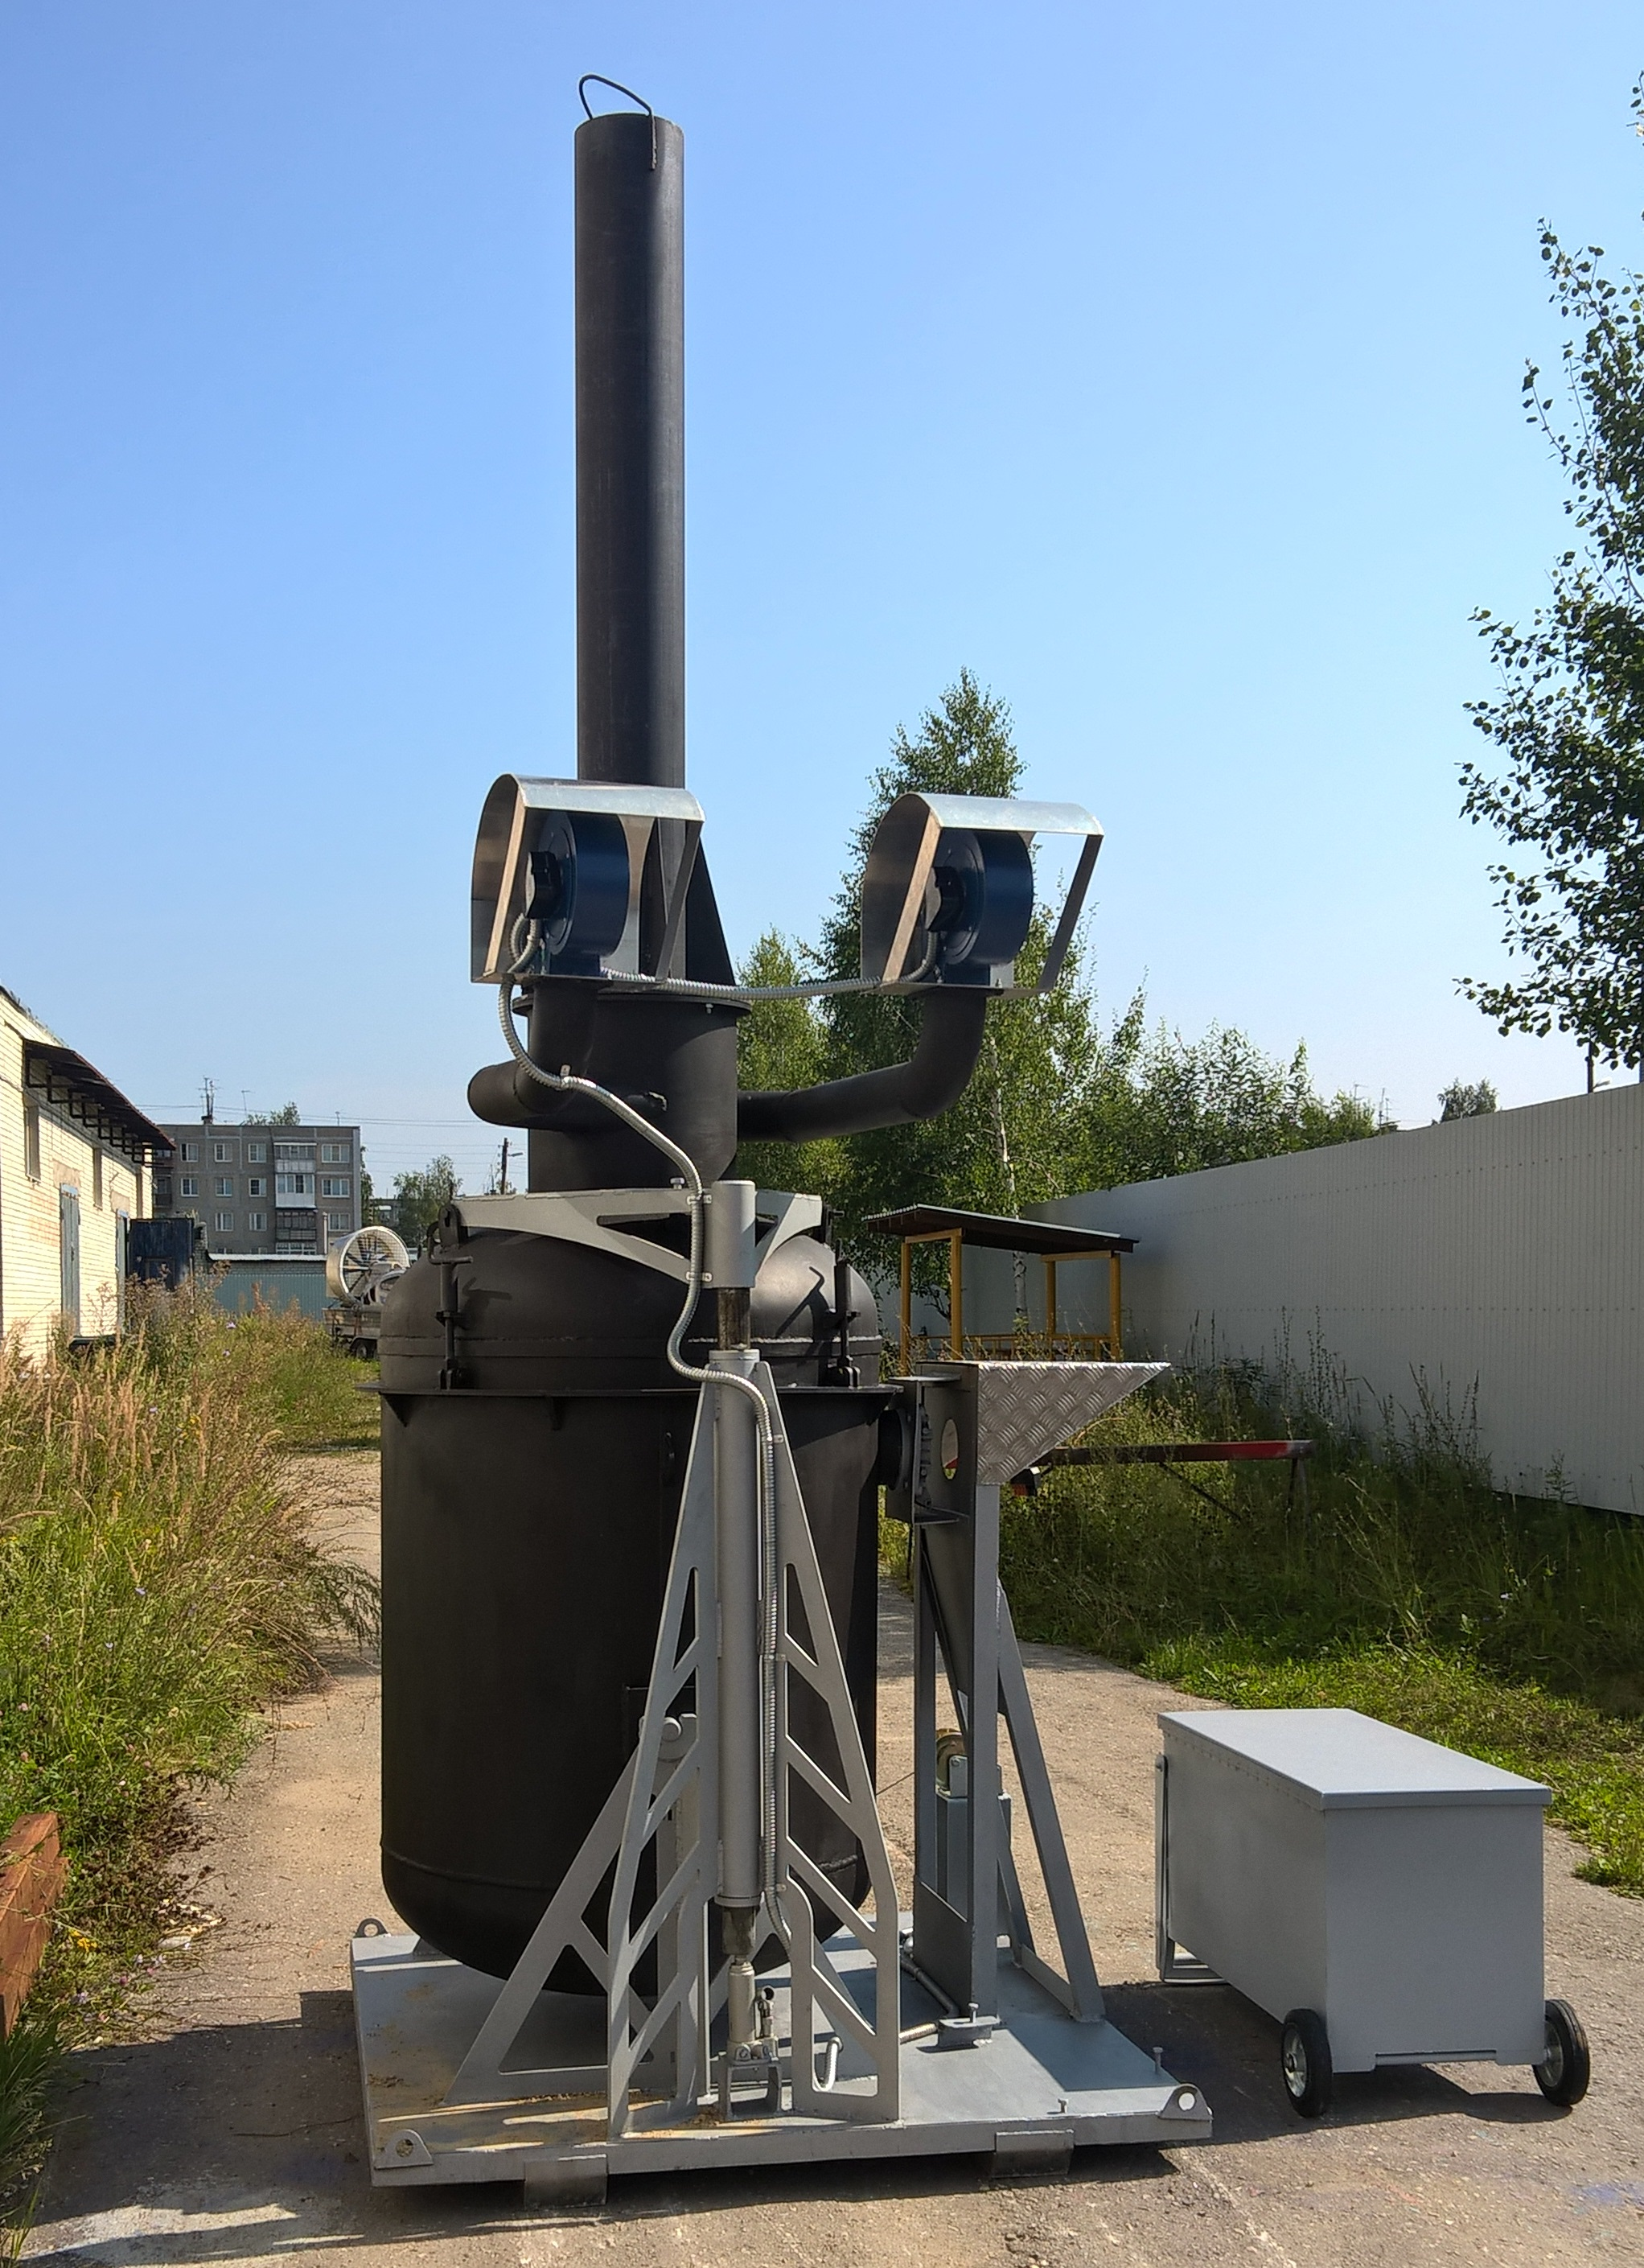 Установка для утилизации отходов «Армагеддон-2»